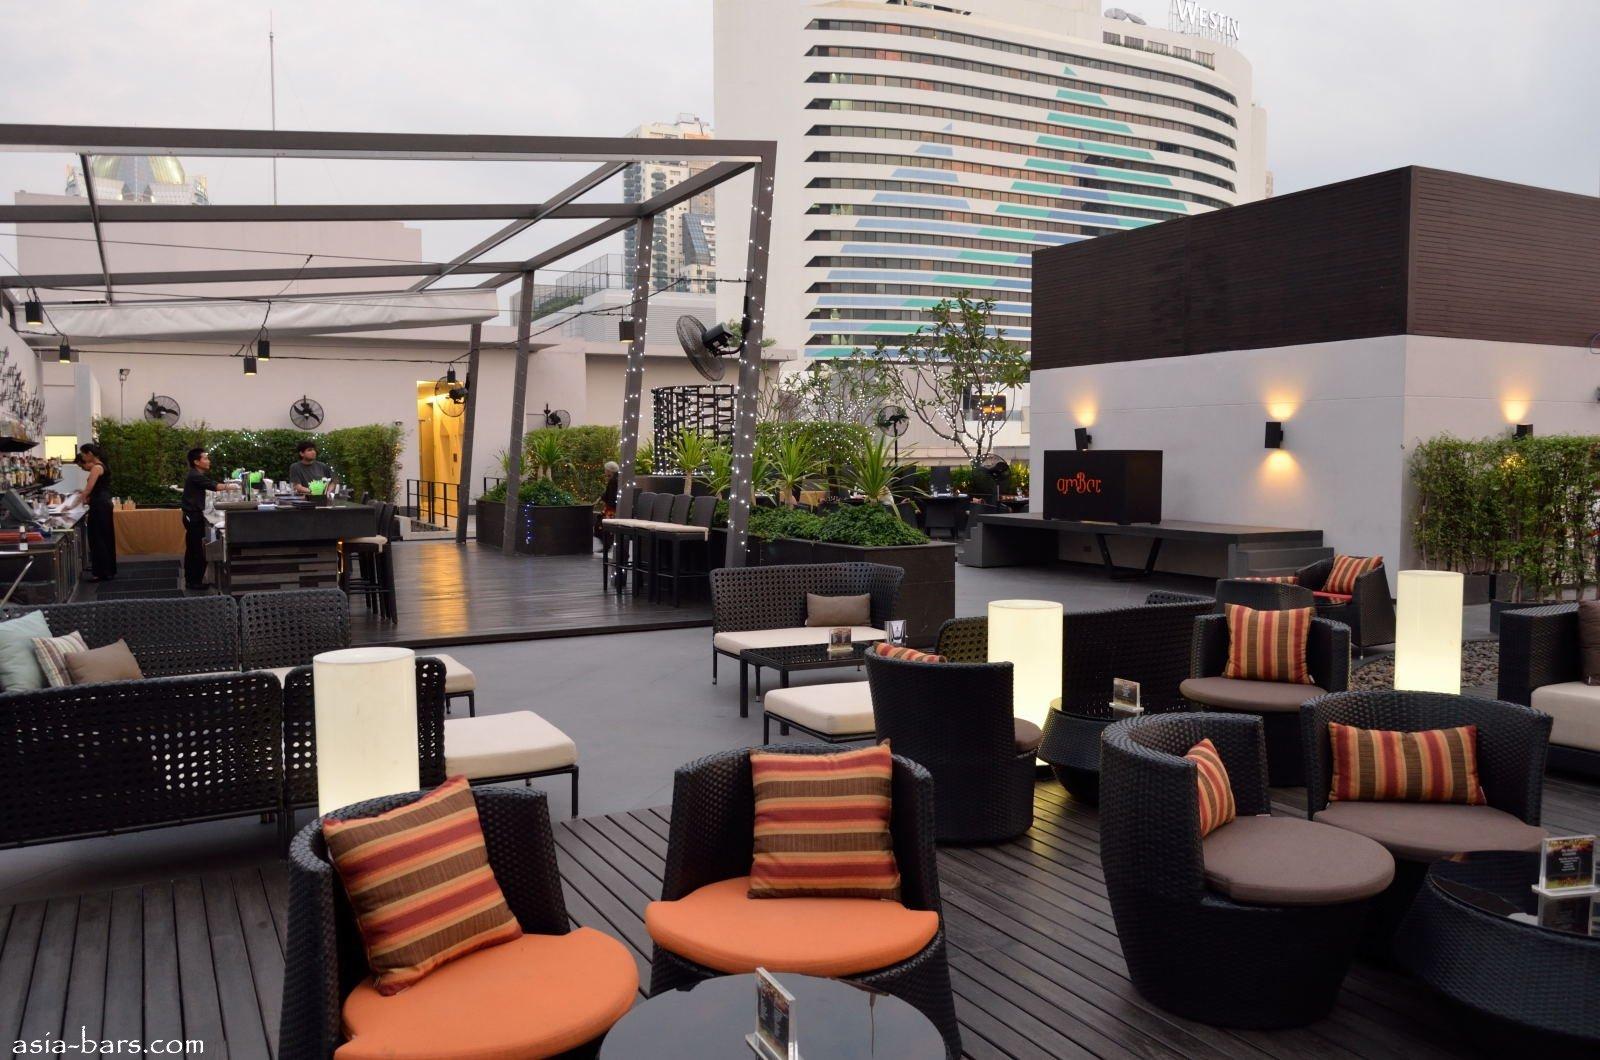 Open Air Kitchen And Bar Menu